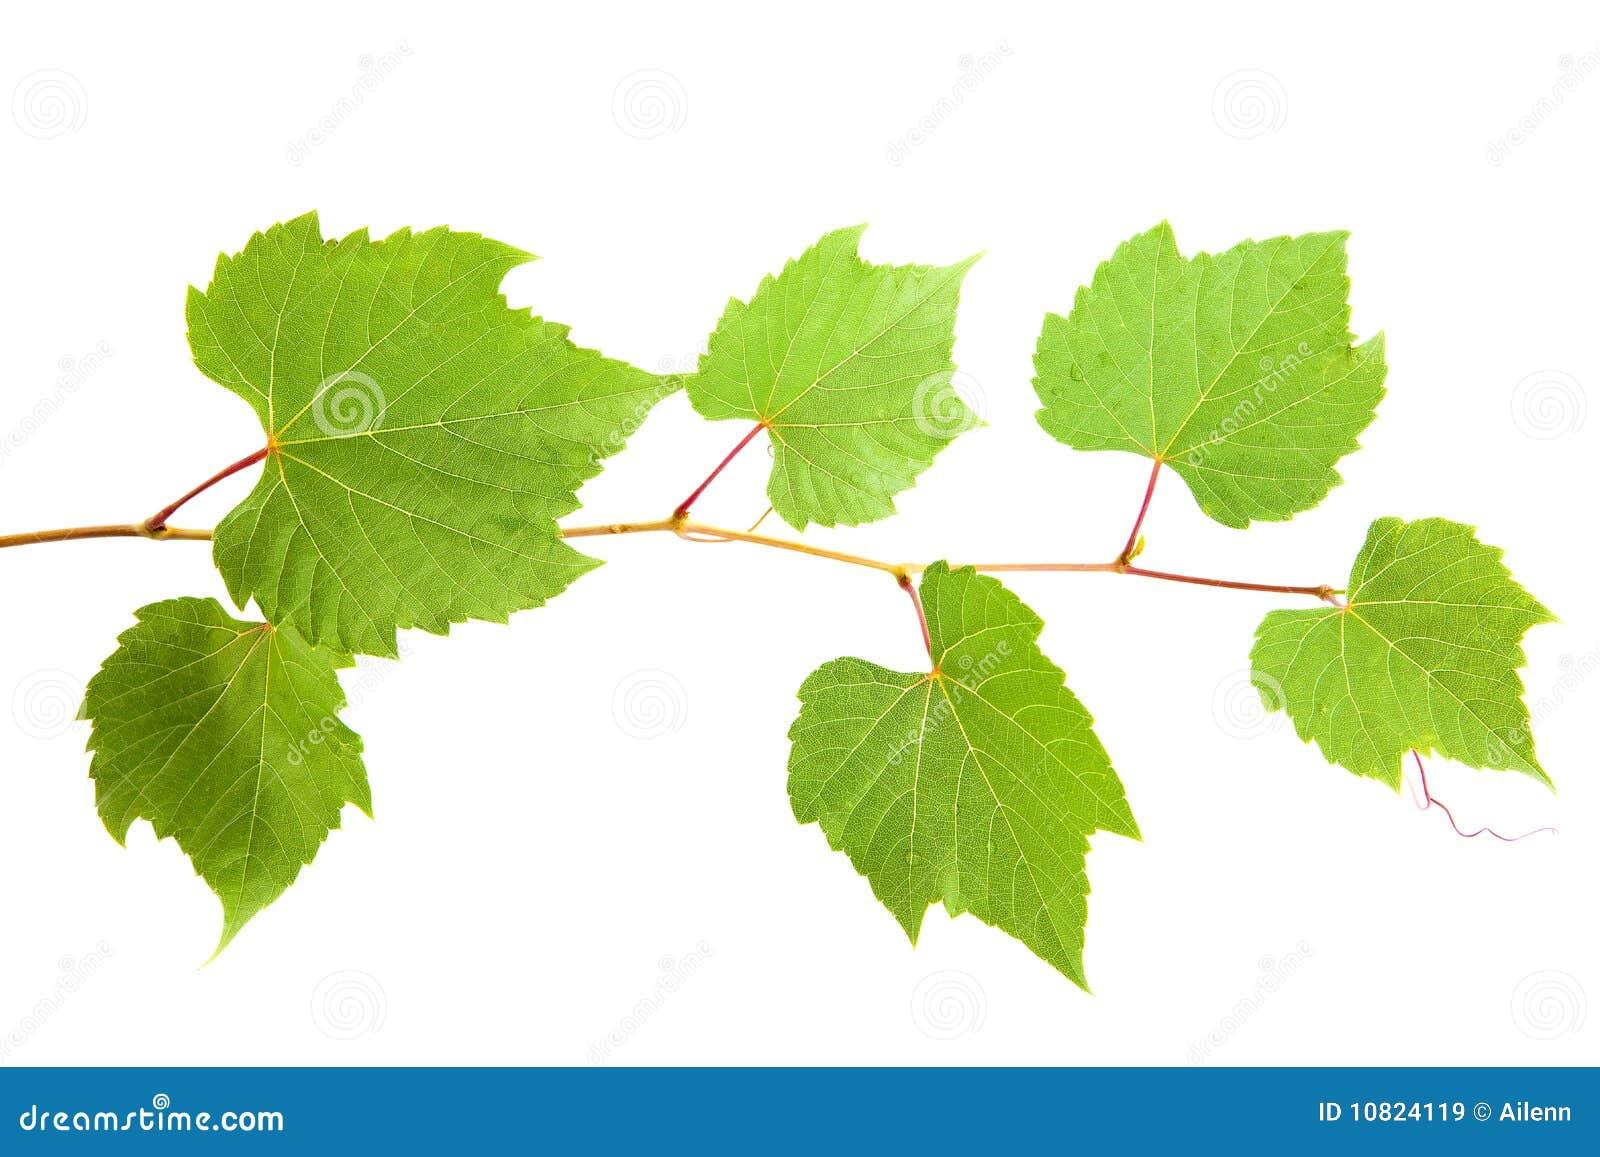 how to make vine leaves